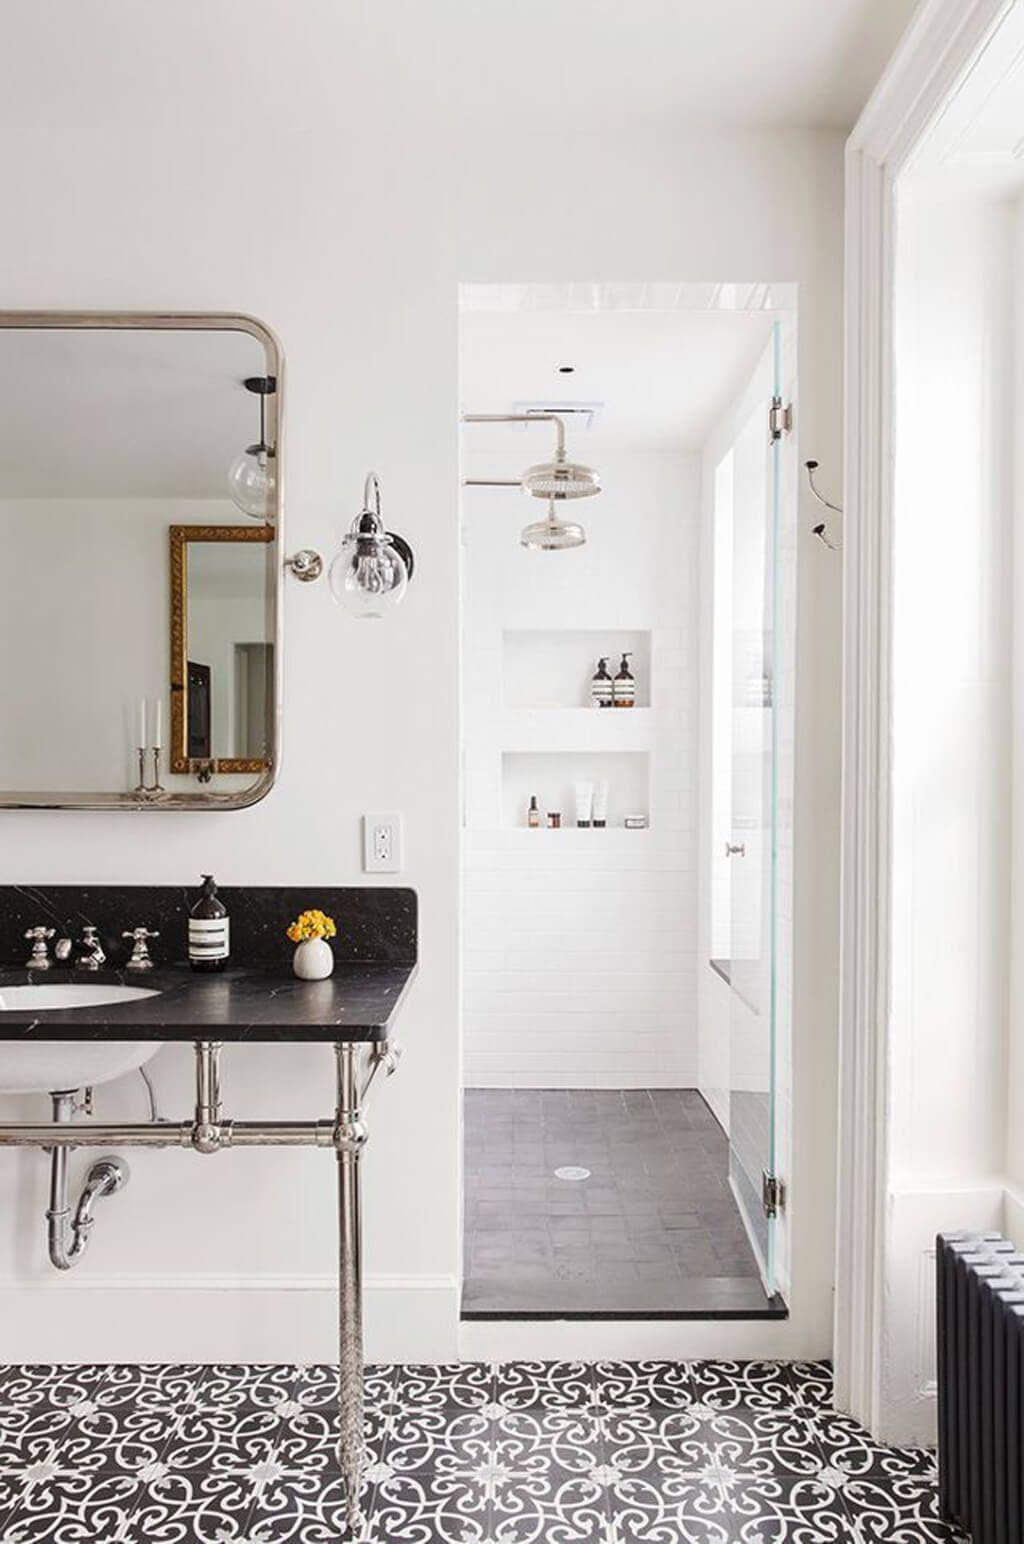 Trending: Chrome Lighting | Chrome, Bathroom designs and Bath